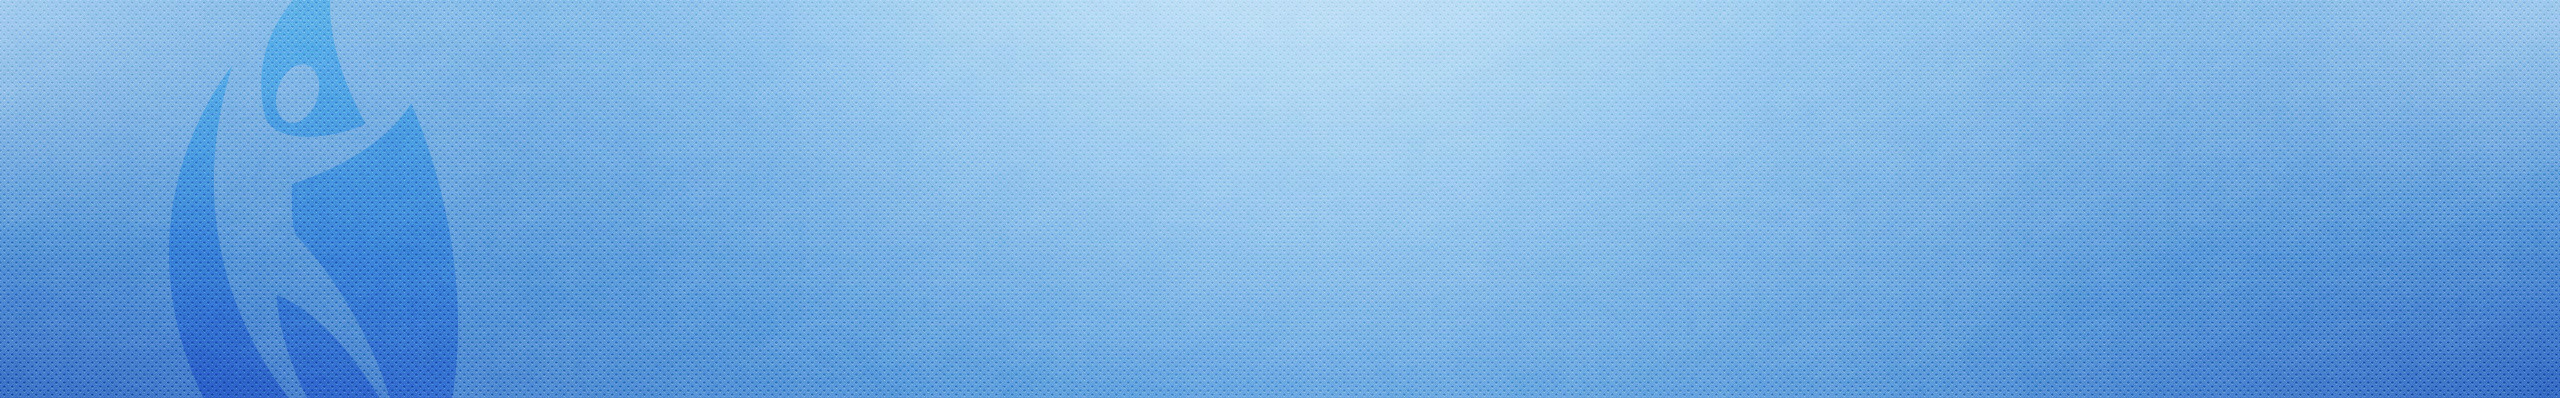 Light-blue-texture-wallpaper-Abstract-wallpapers-21390-sas - San ...